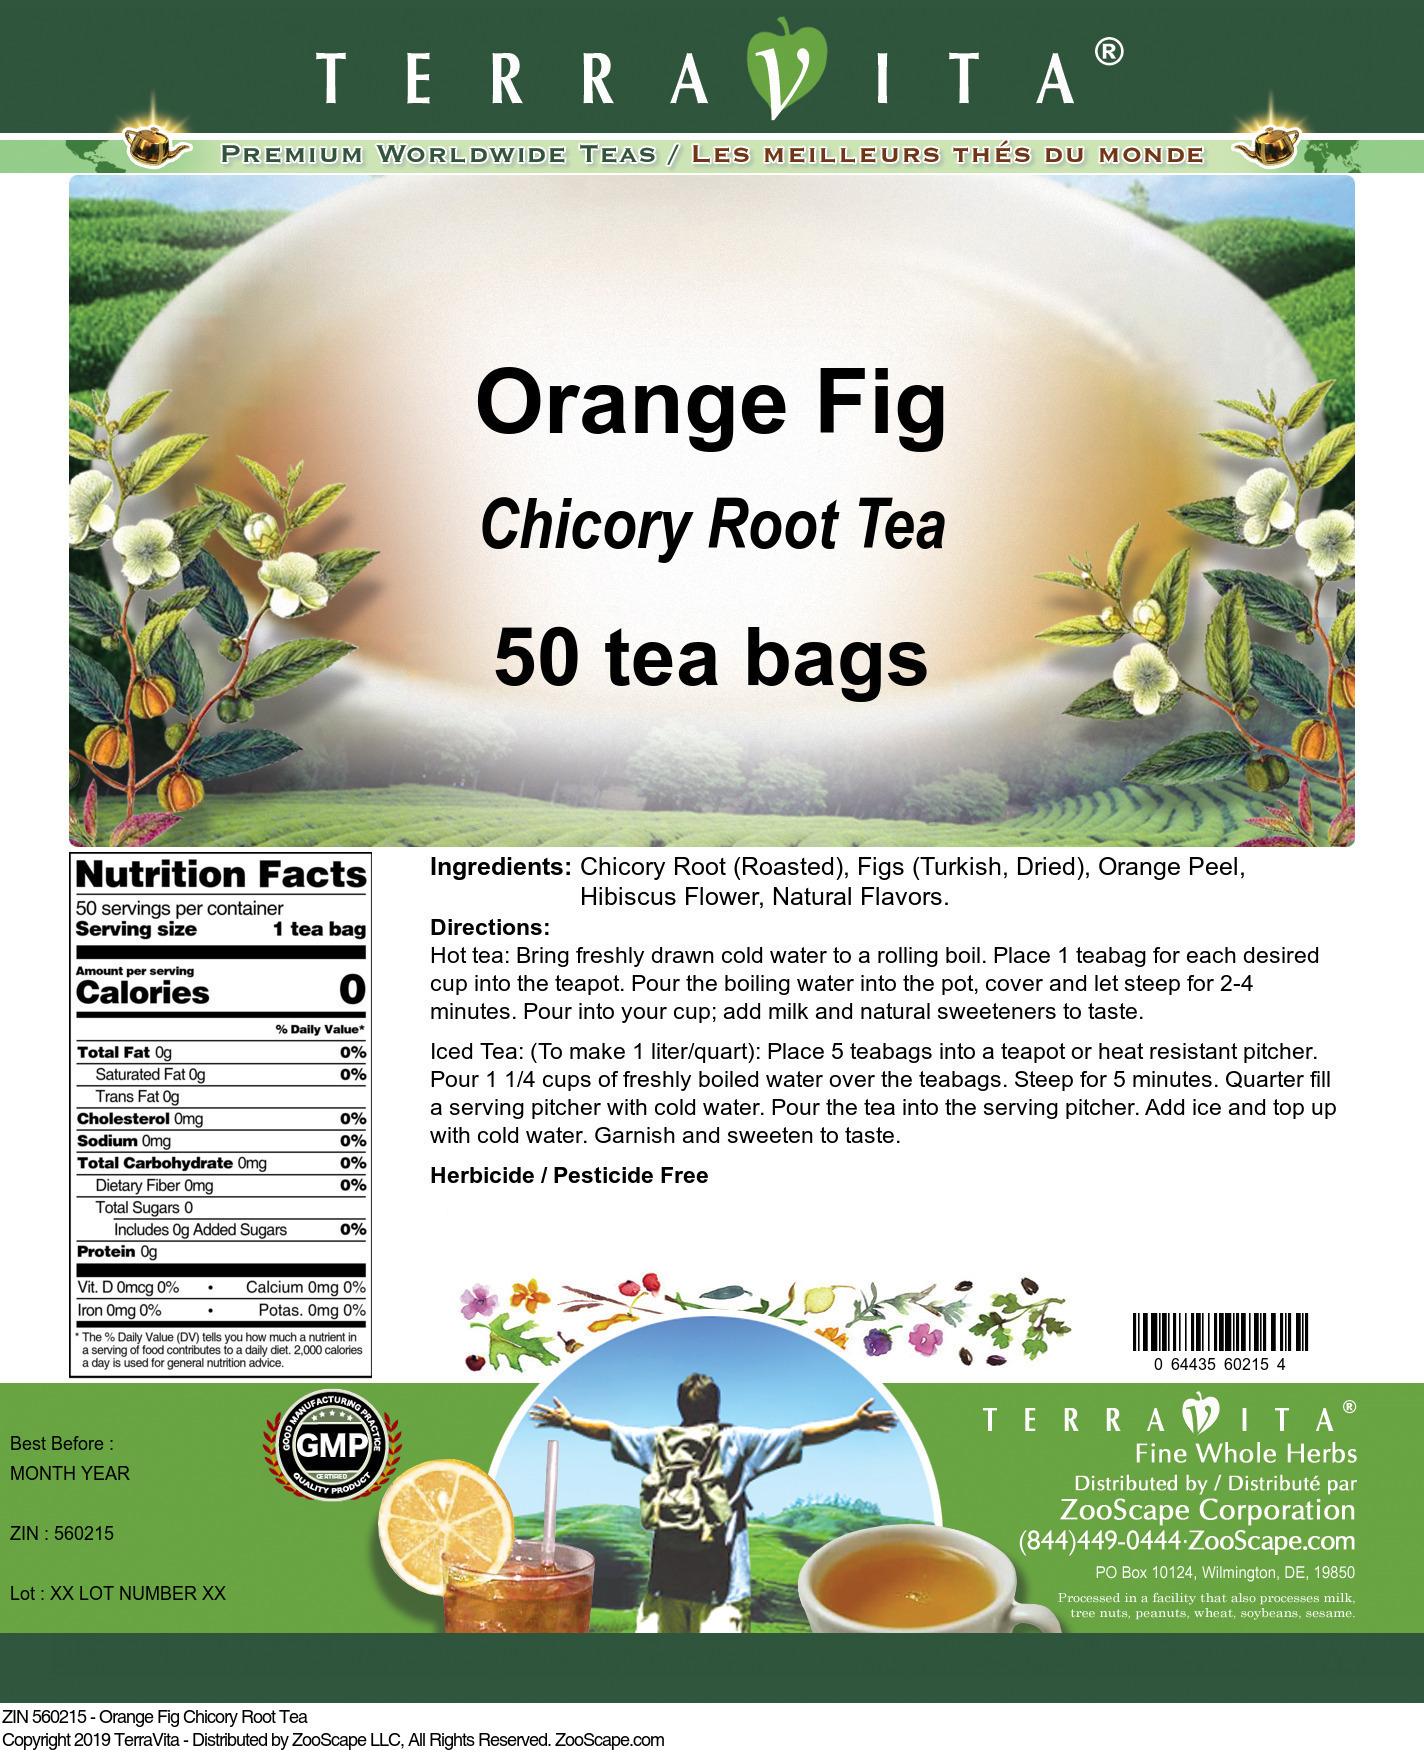 Orange Fig Chicory Root Tea